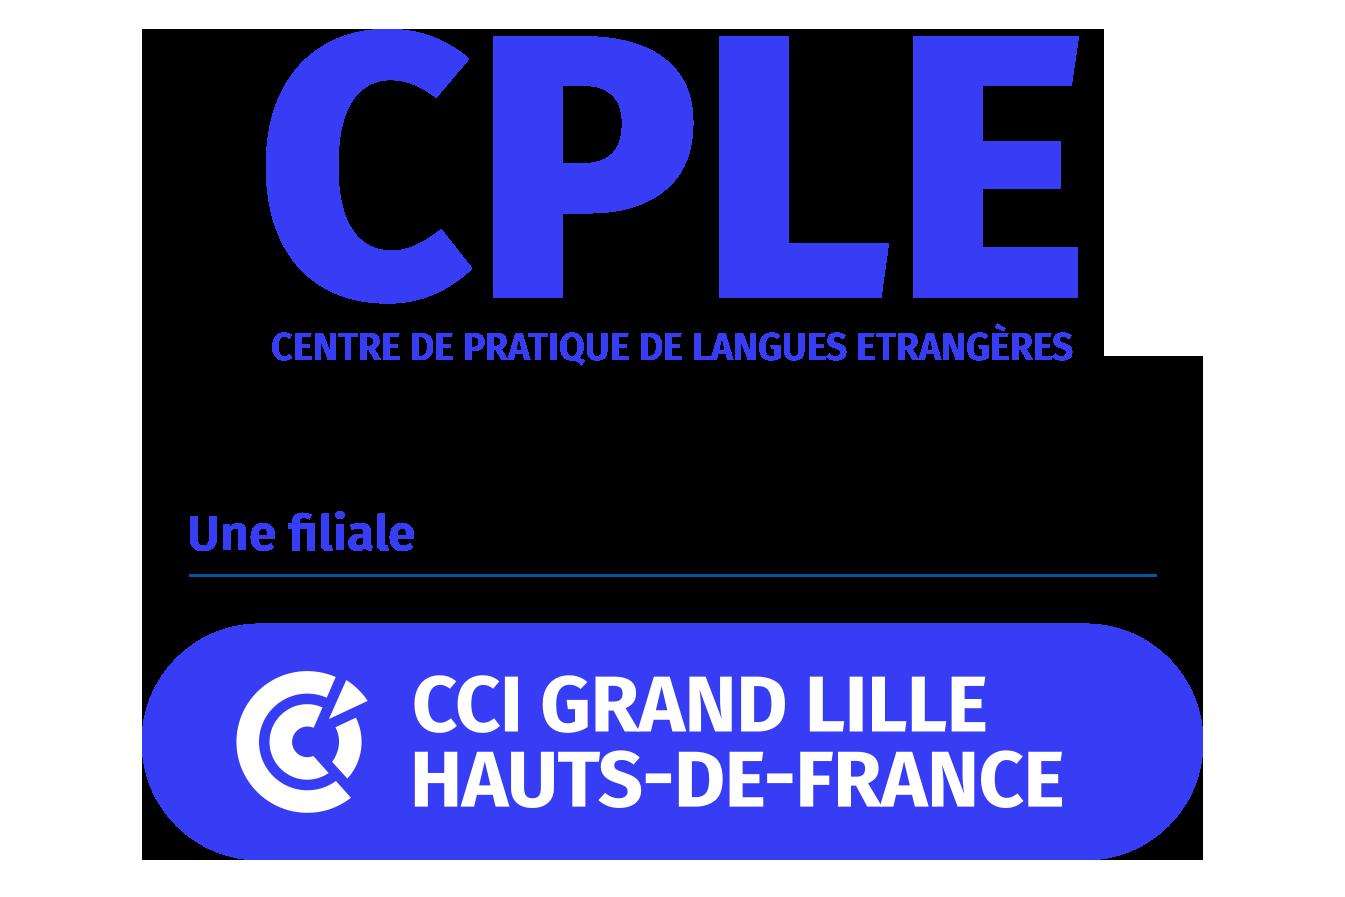 Logo CPLE et CCI Grand Lille